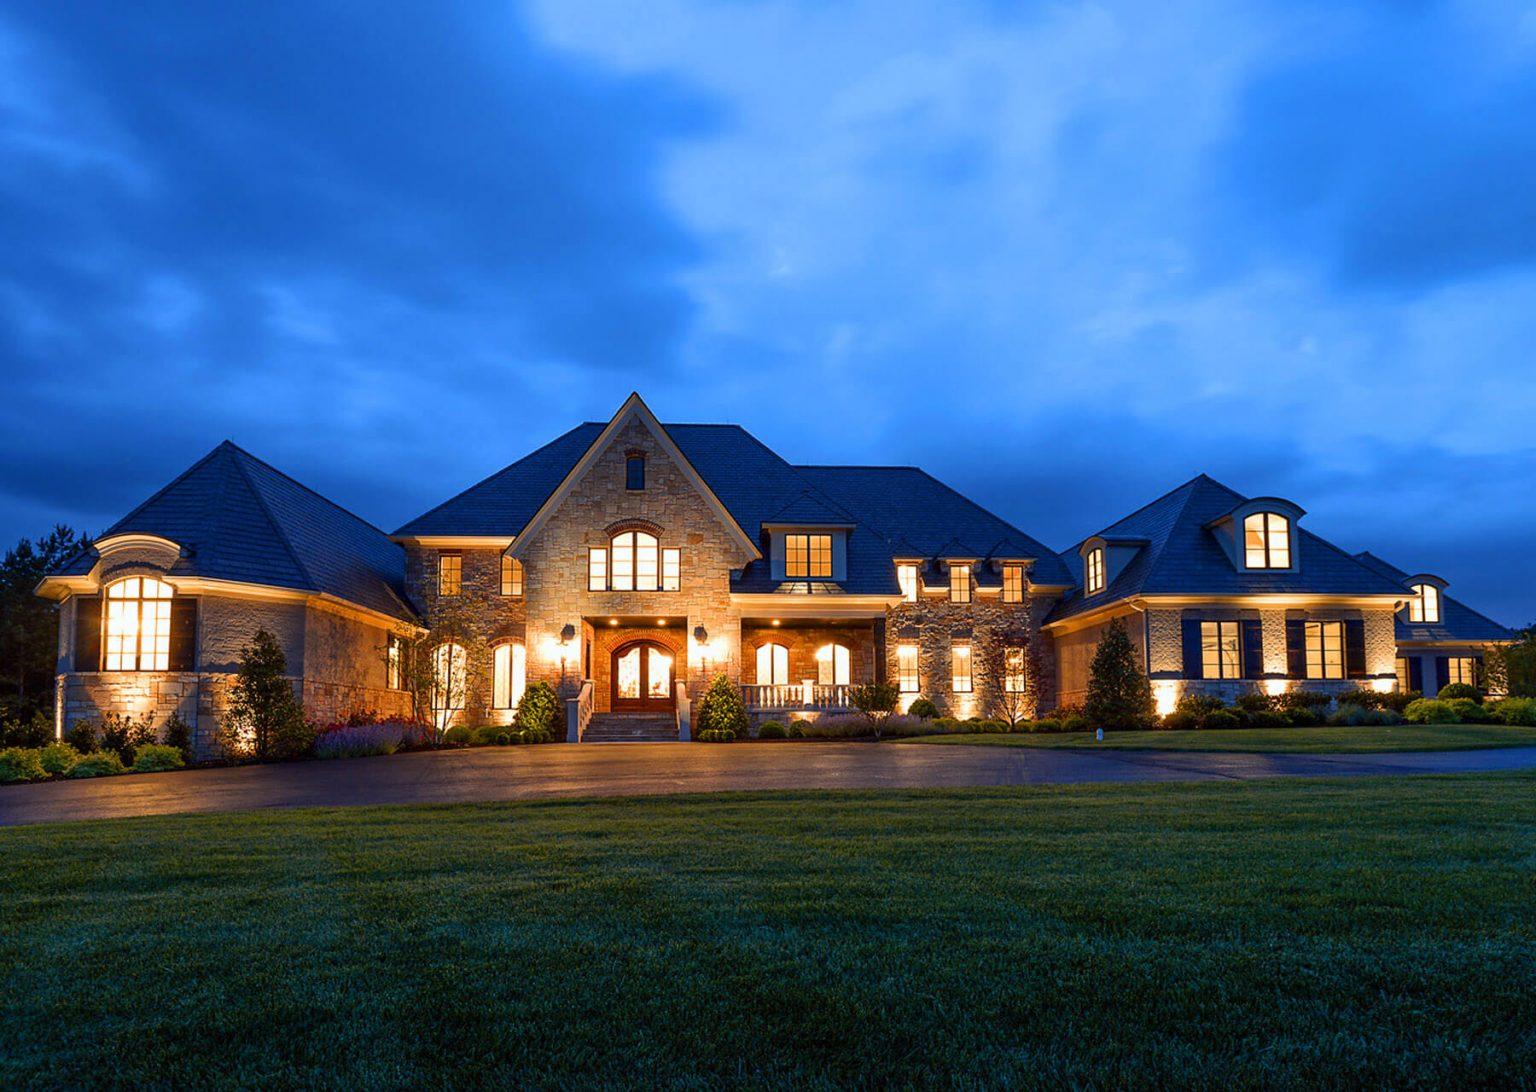 large villa home at dusk